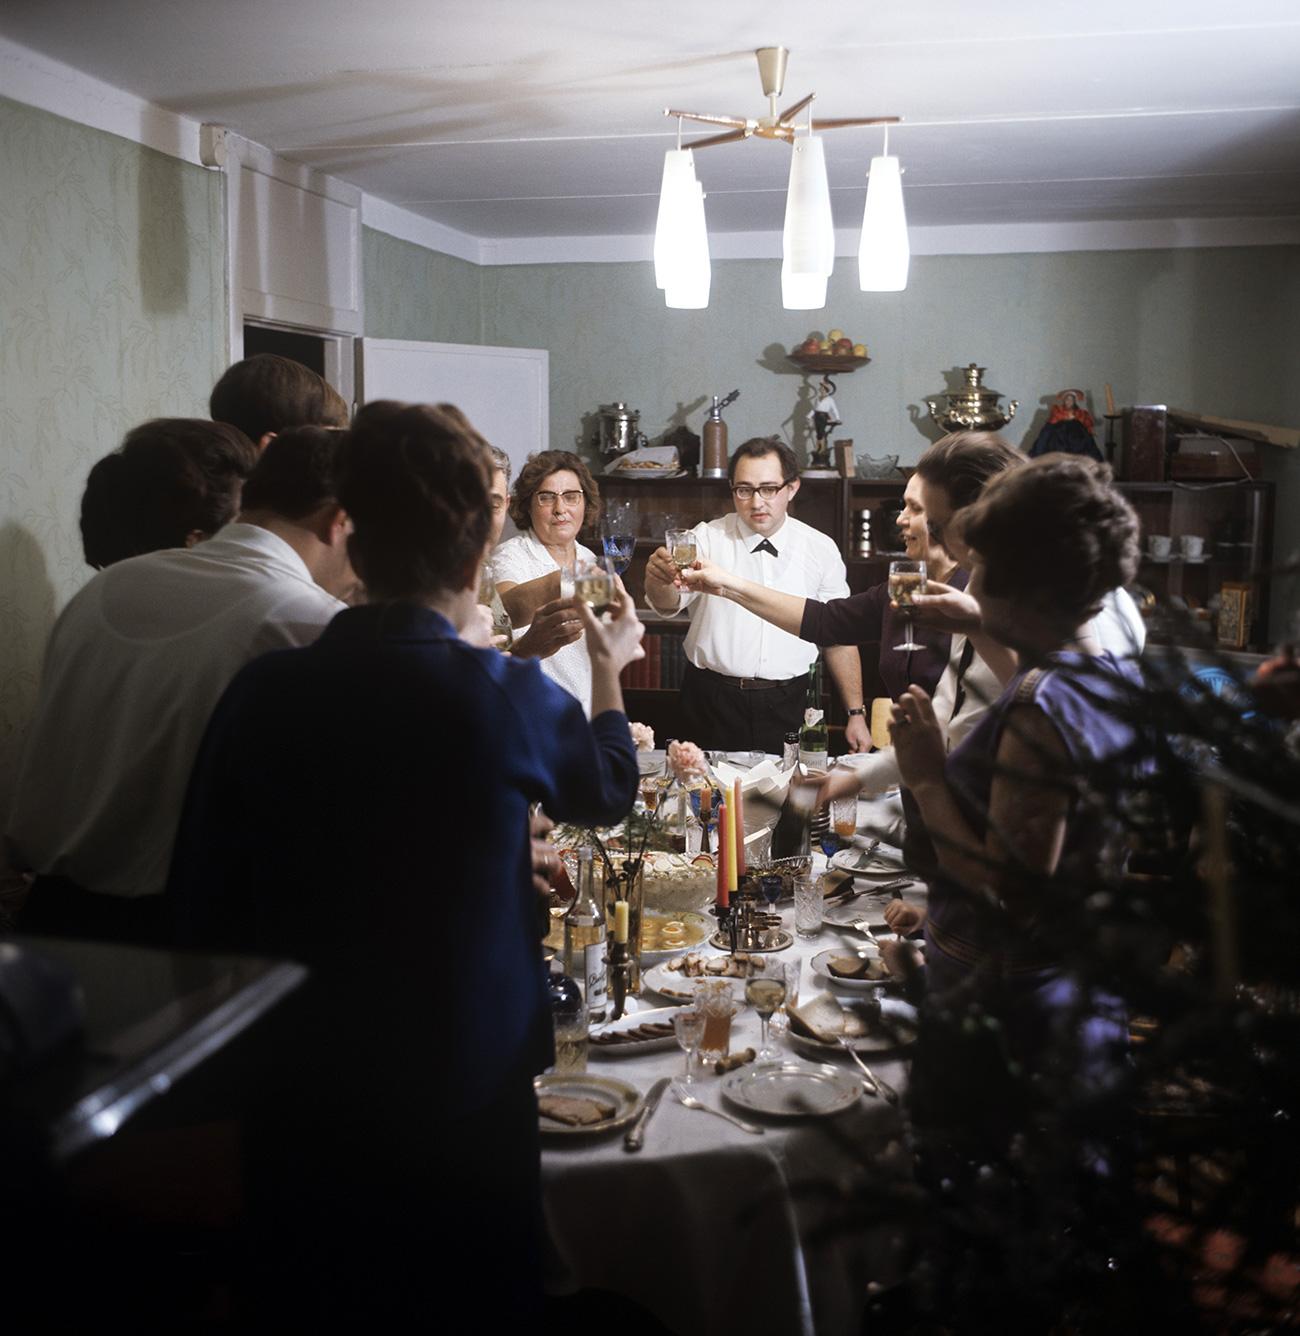 Борис Кавашкин / РИА Новости